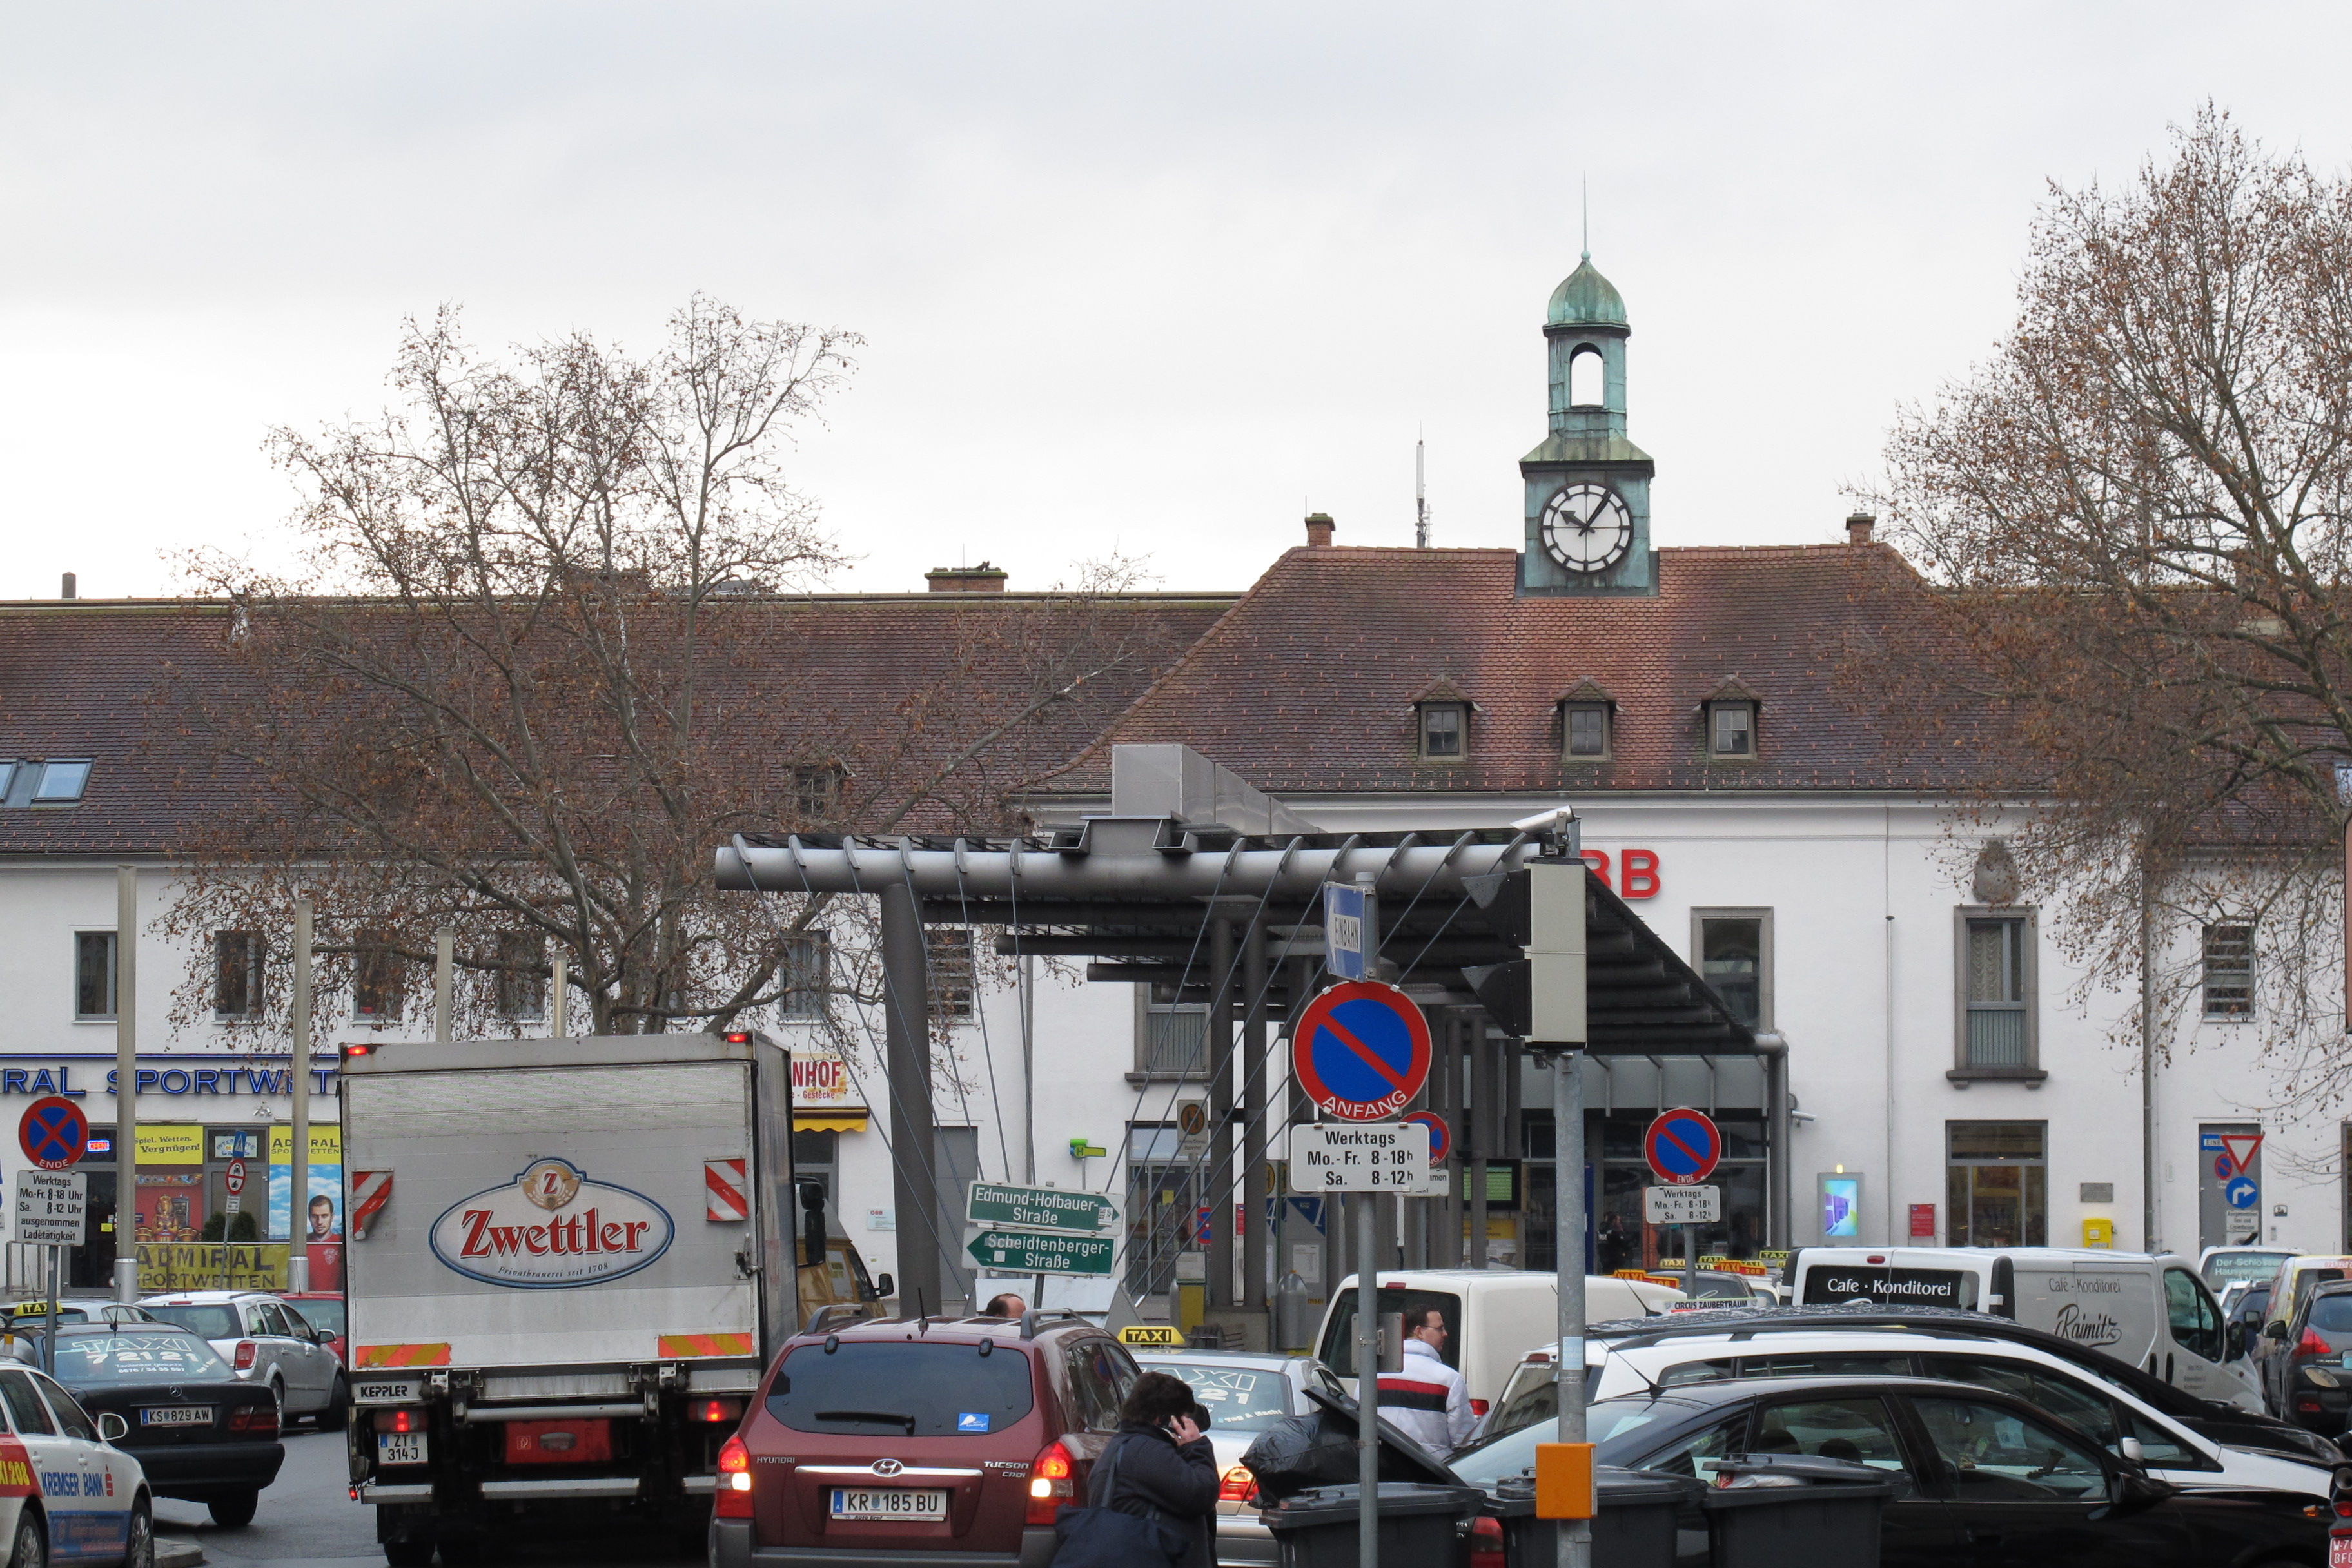 Mann sucht frau gssendorf Sexdate ottersberg